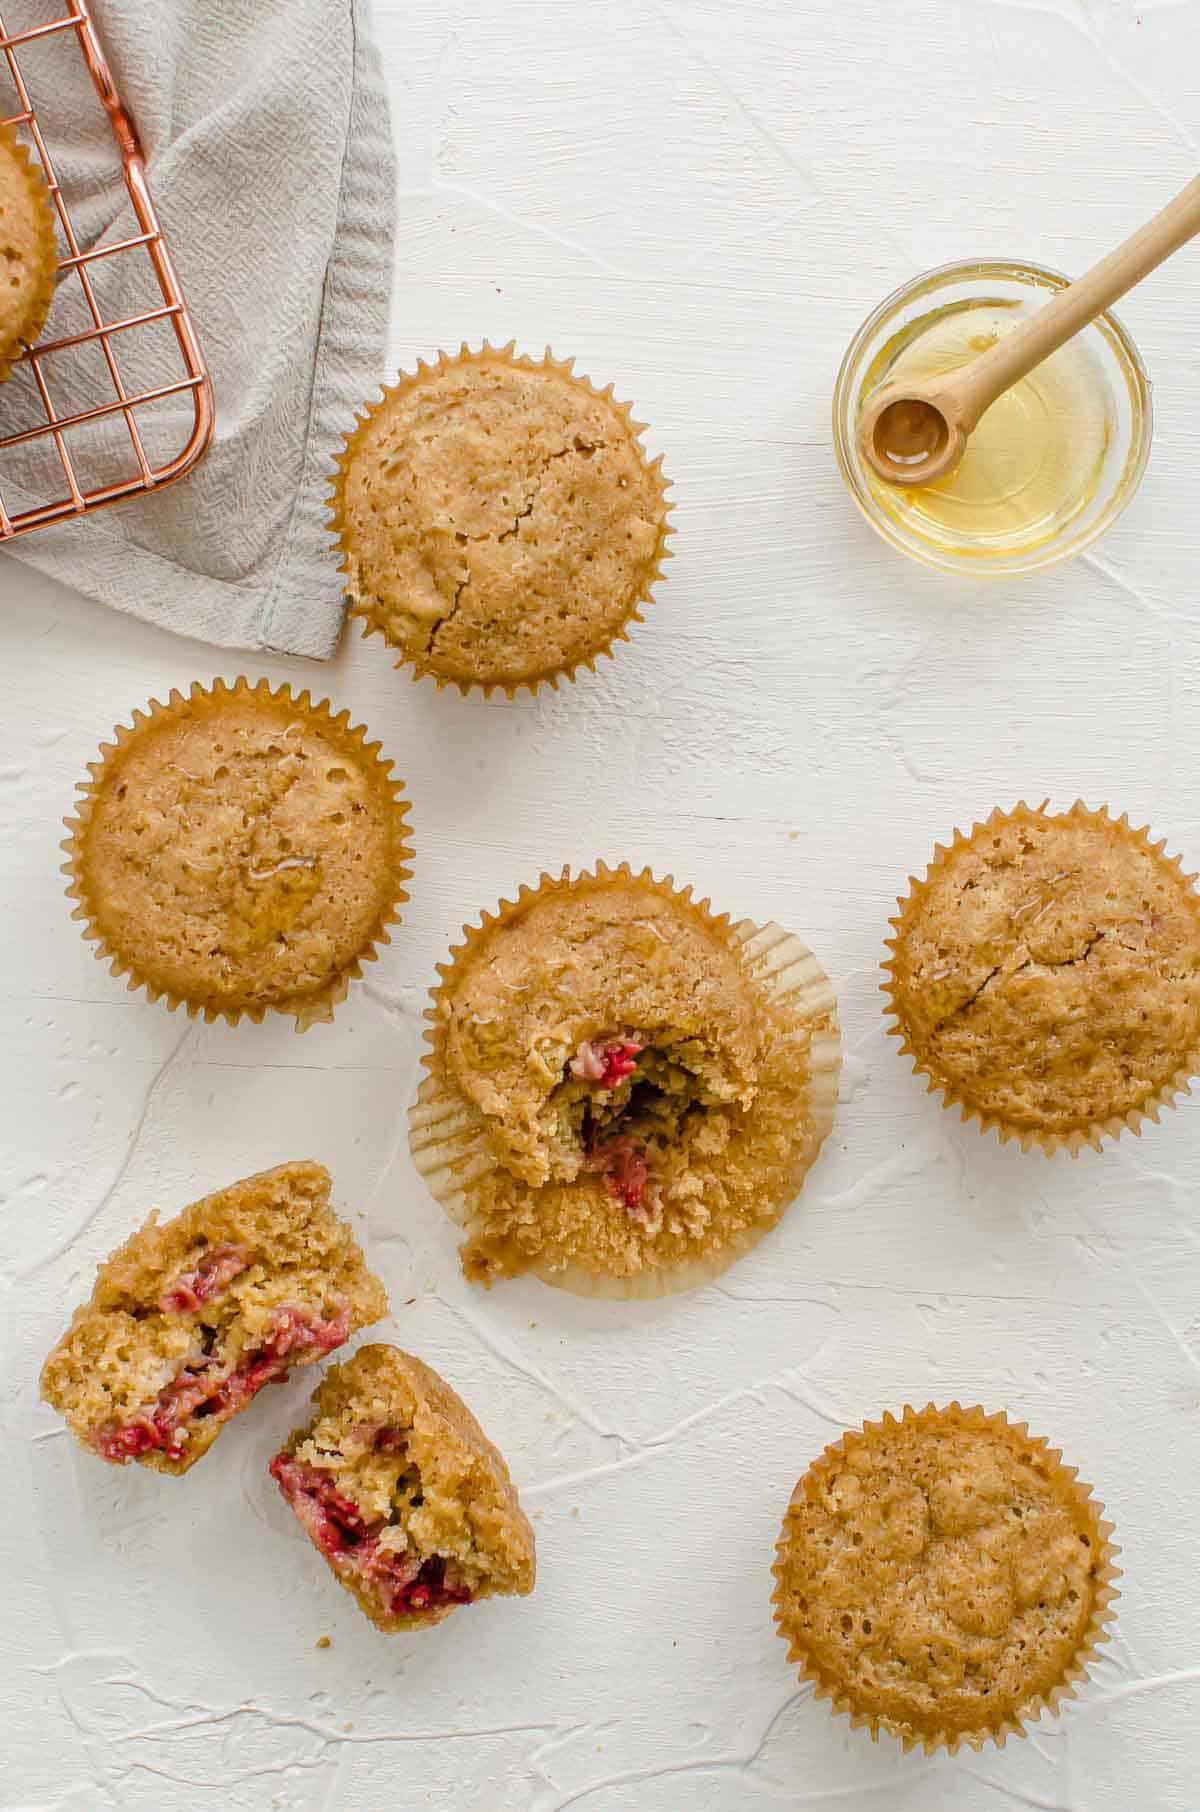 Birds eye view image of raspberry muffins.